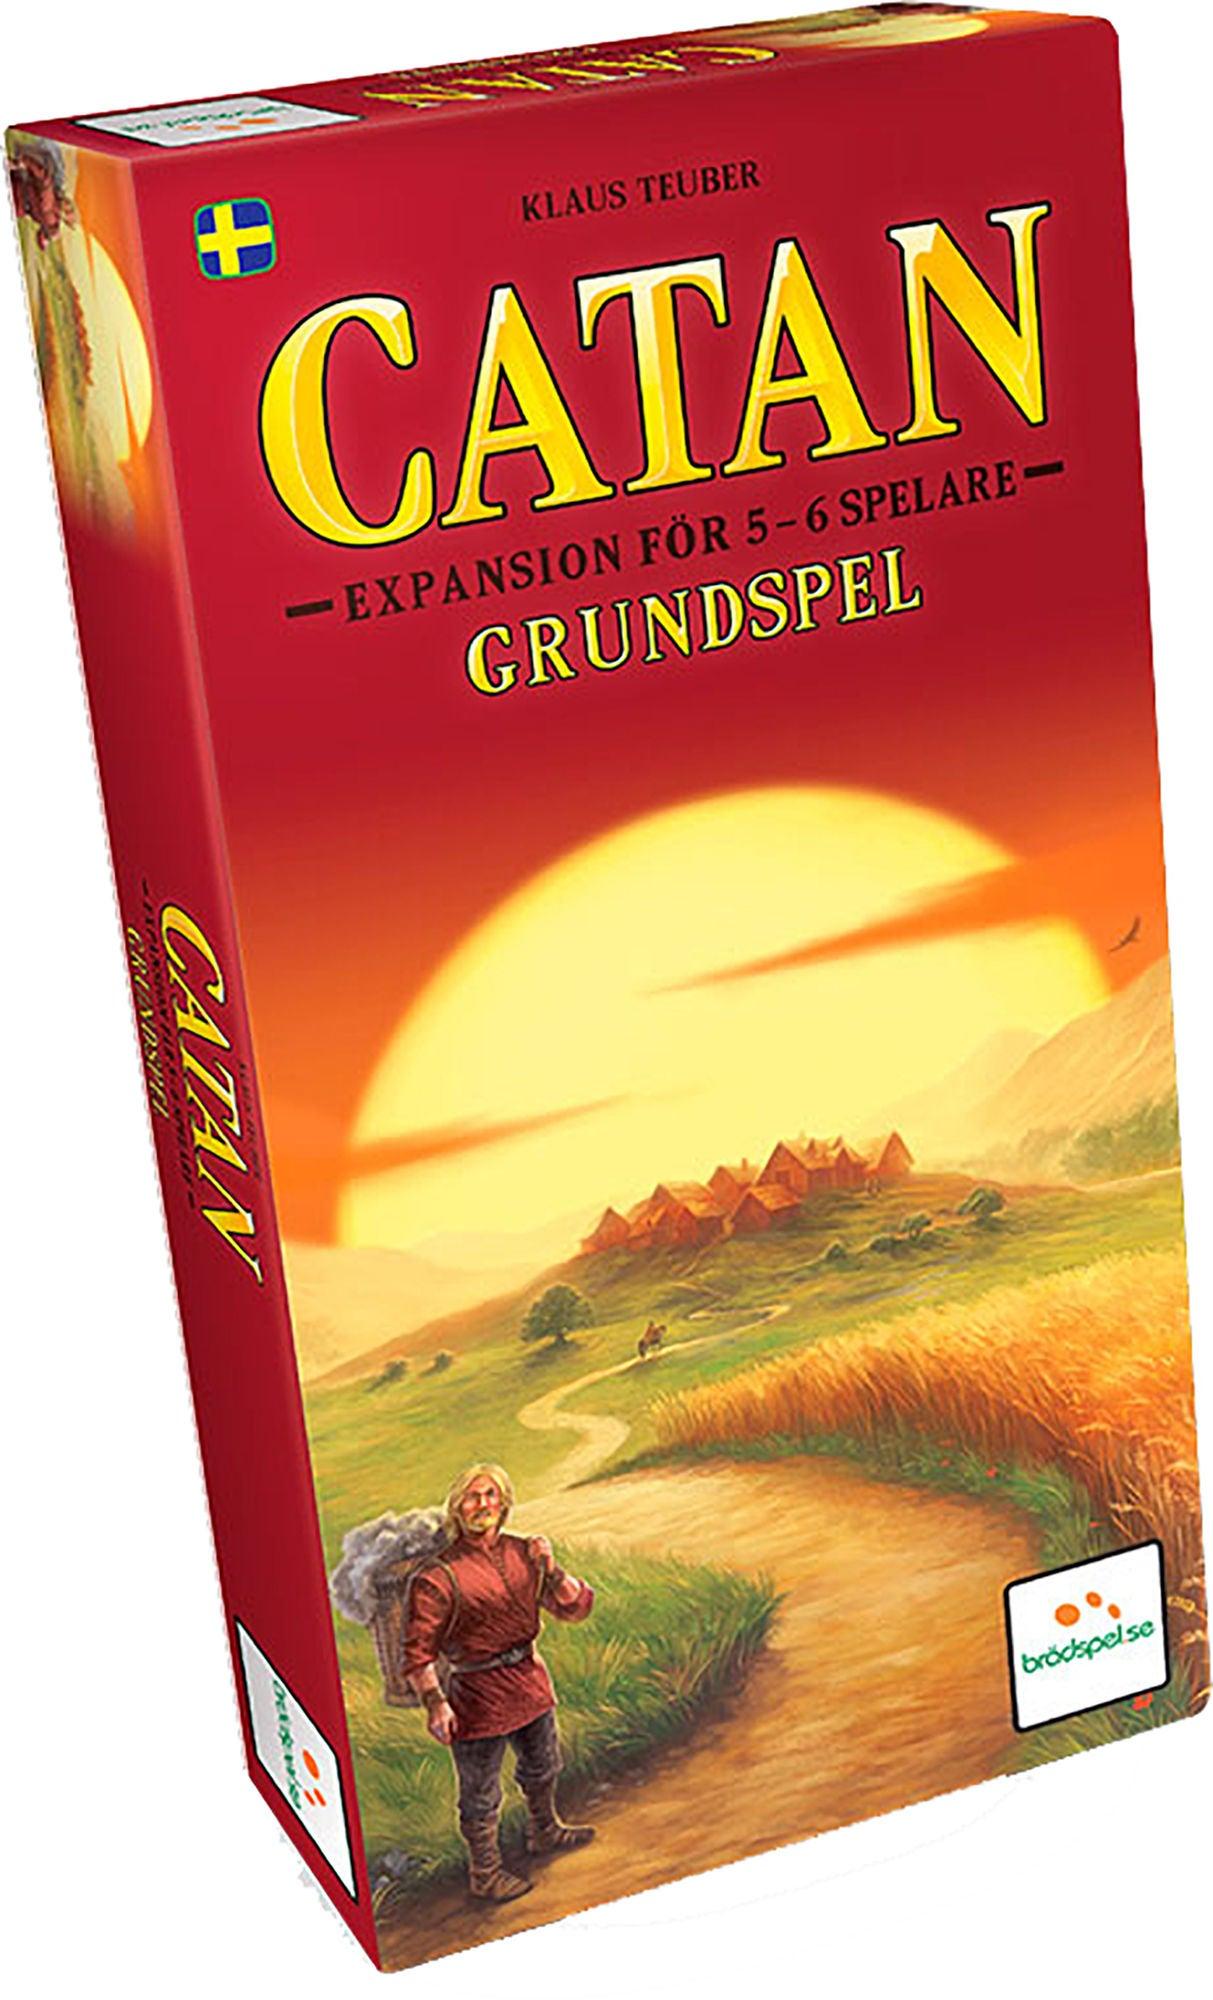 Catan 5-6 Familjespel